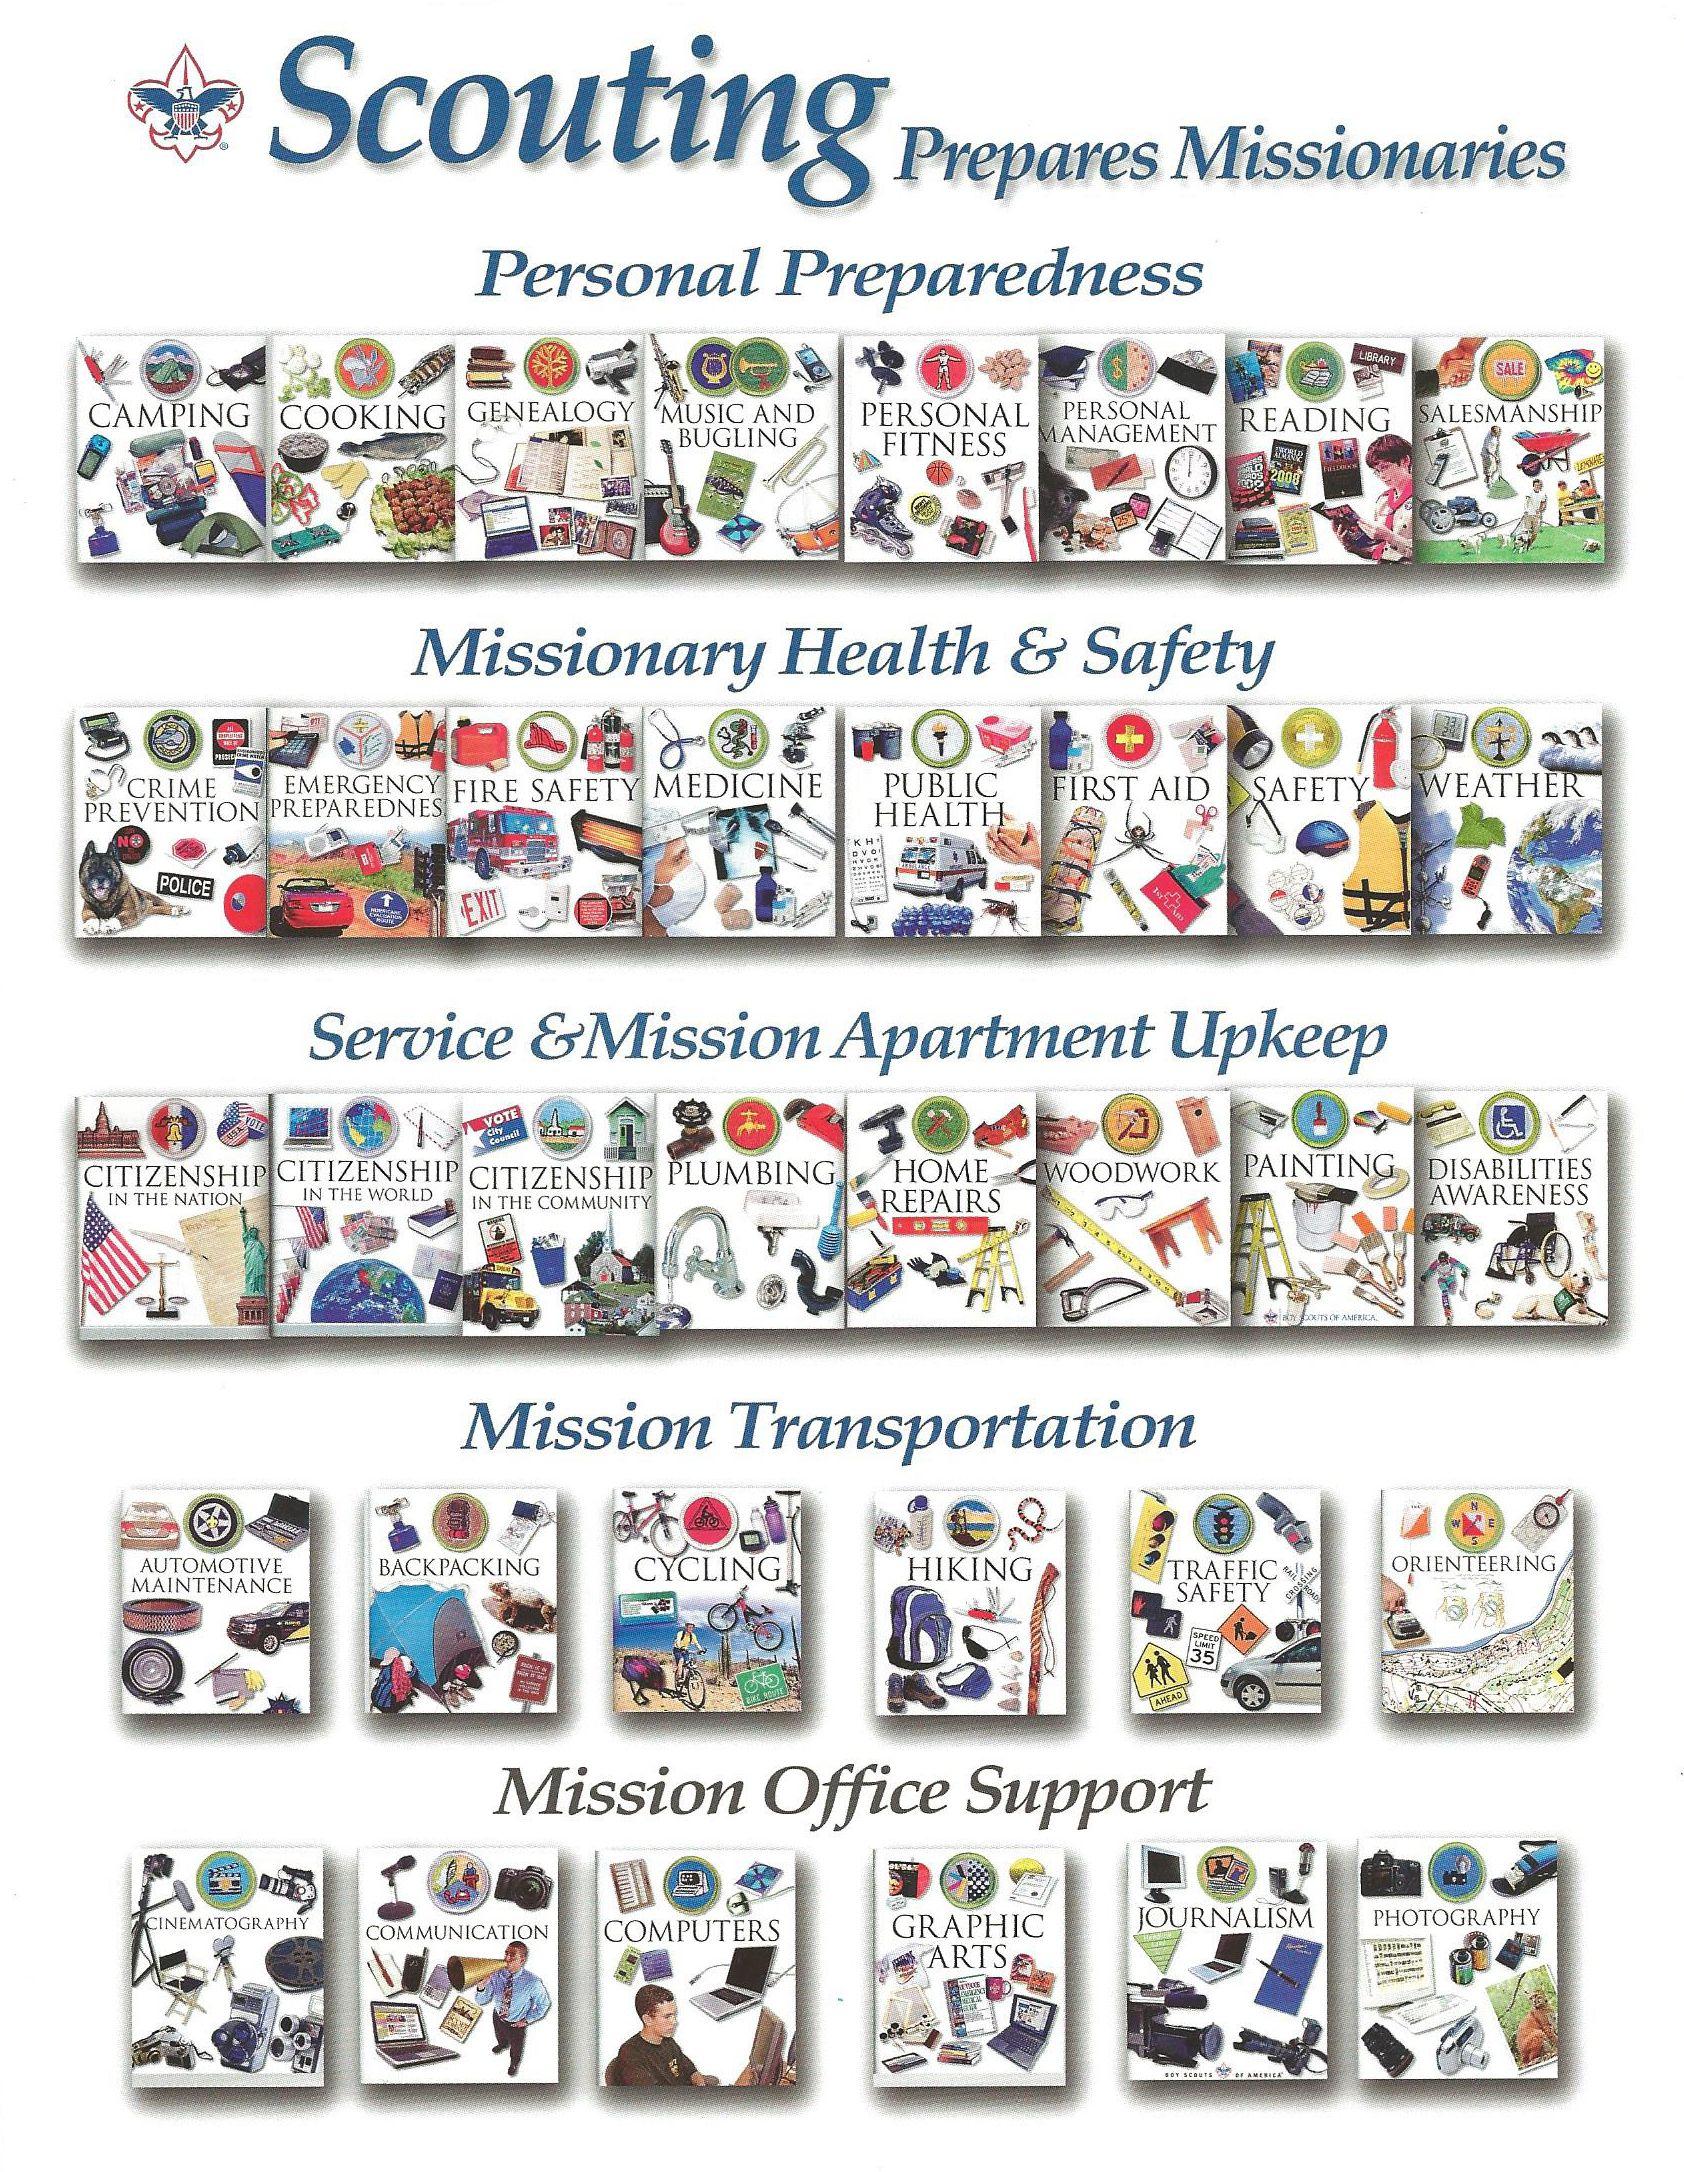 Scouting Merit Badges That Can Help Prepare Missionaries